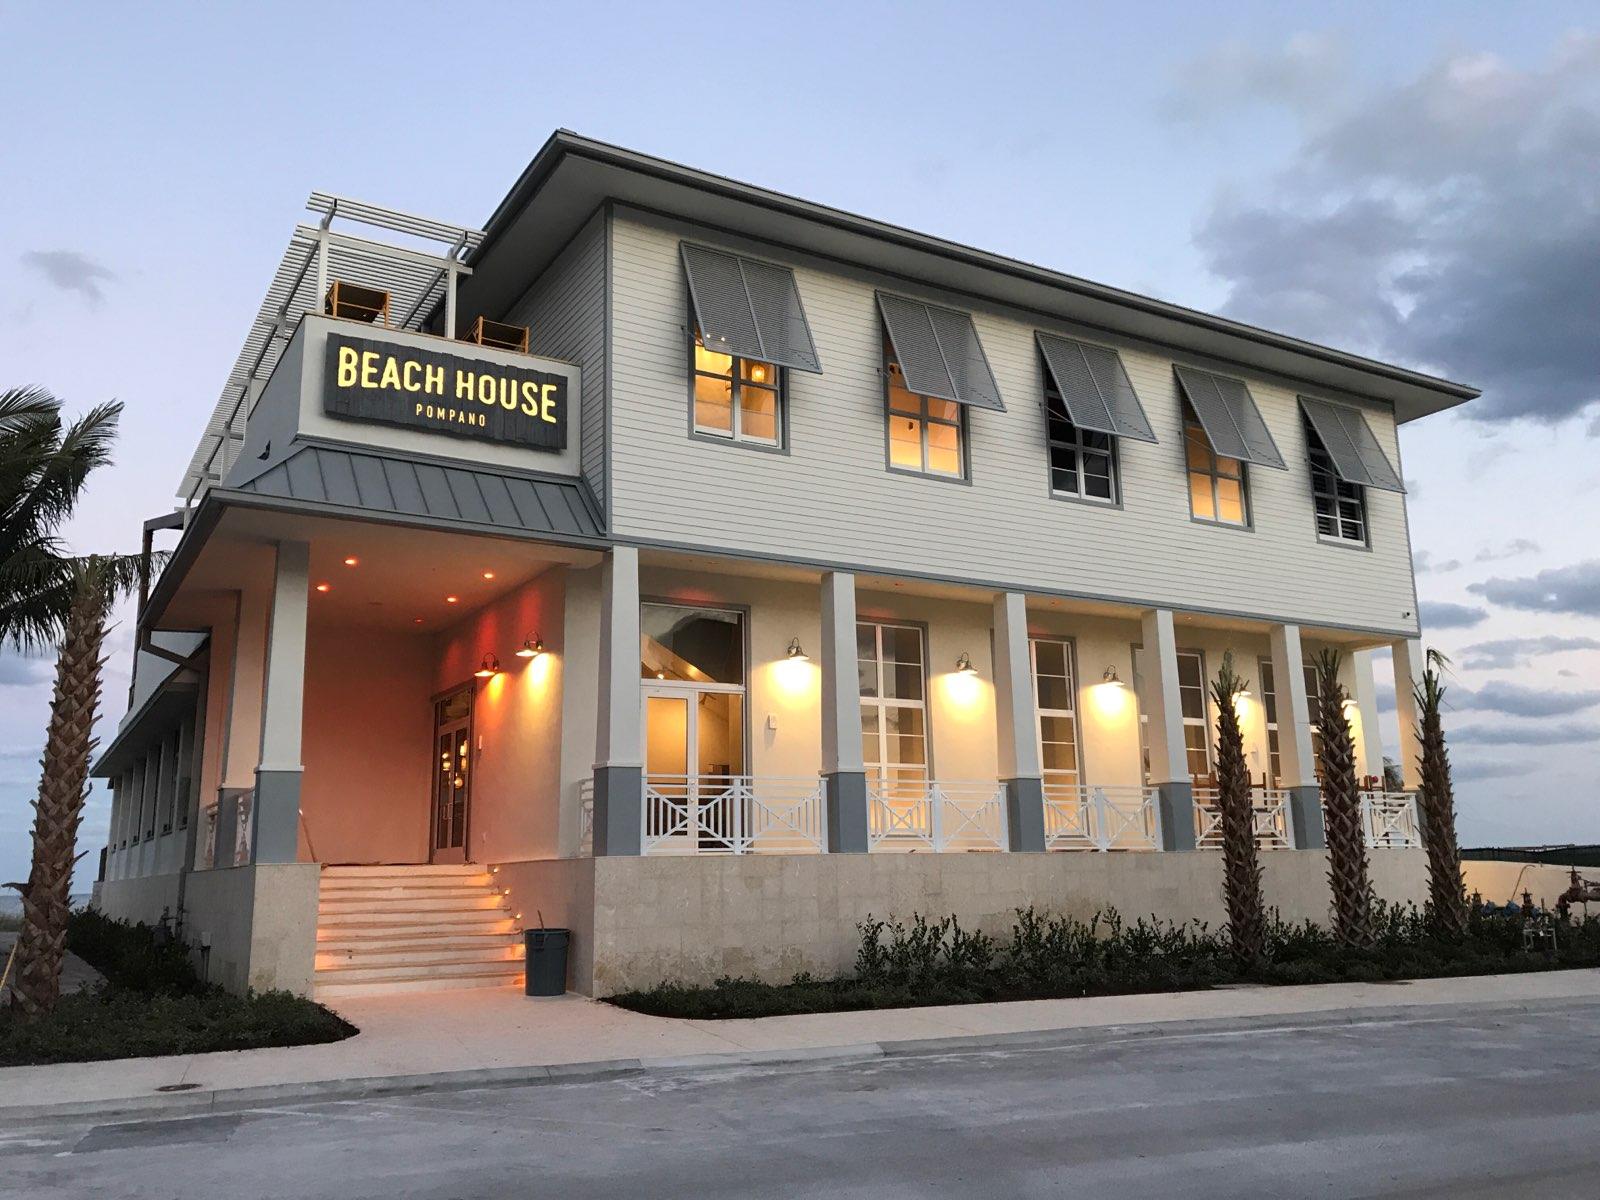 Restaurants In Pompano Beach Florida Best Restaurants Near Me